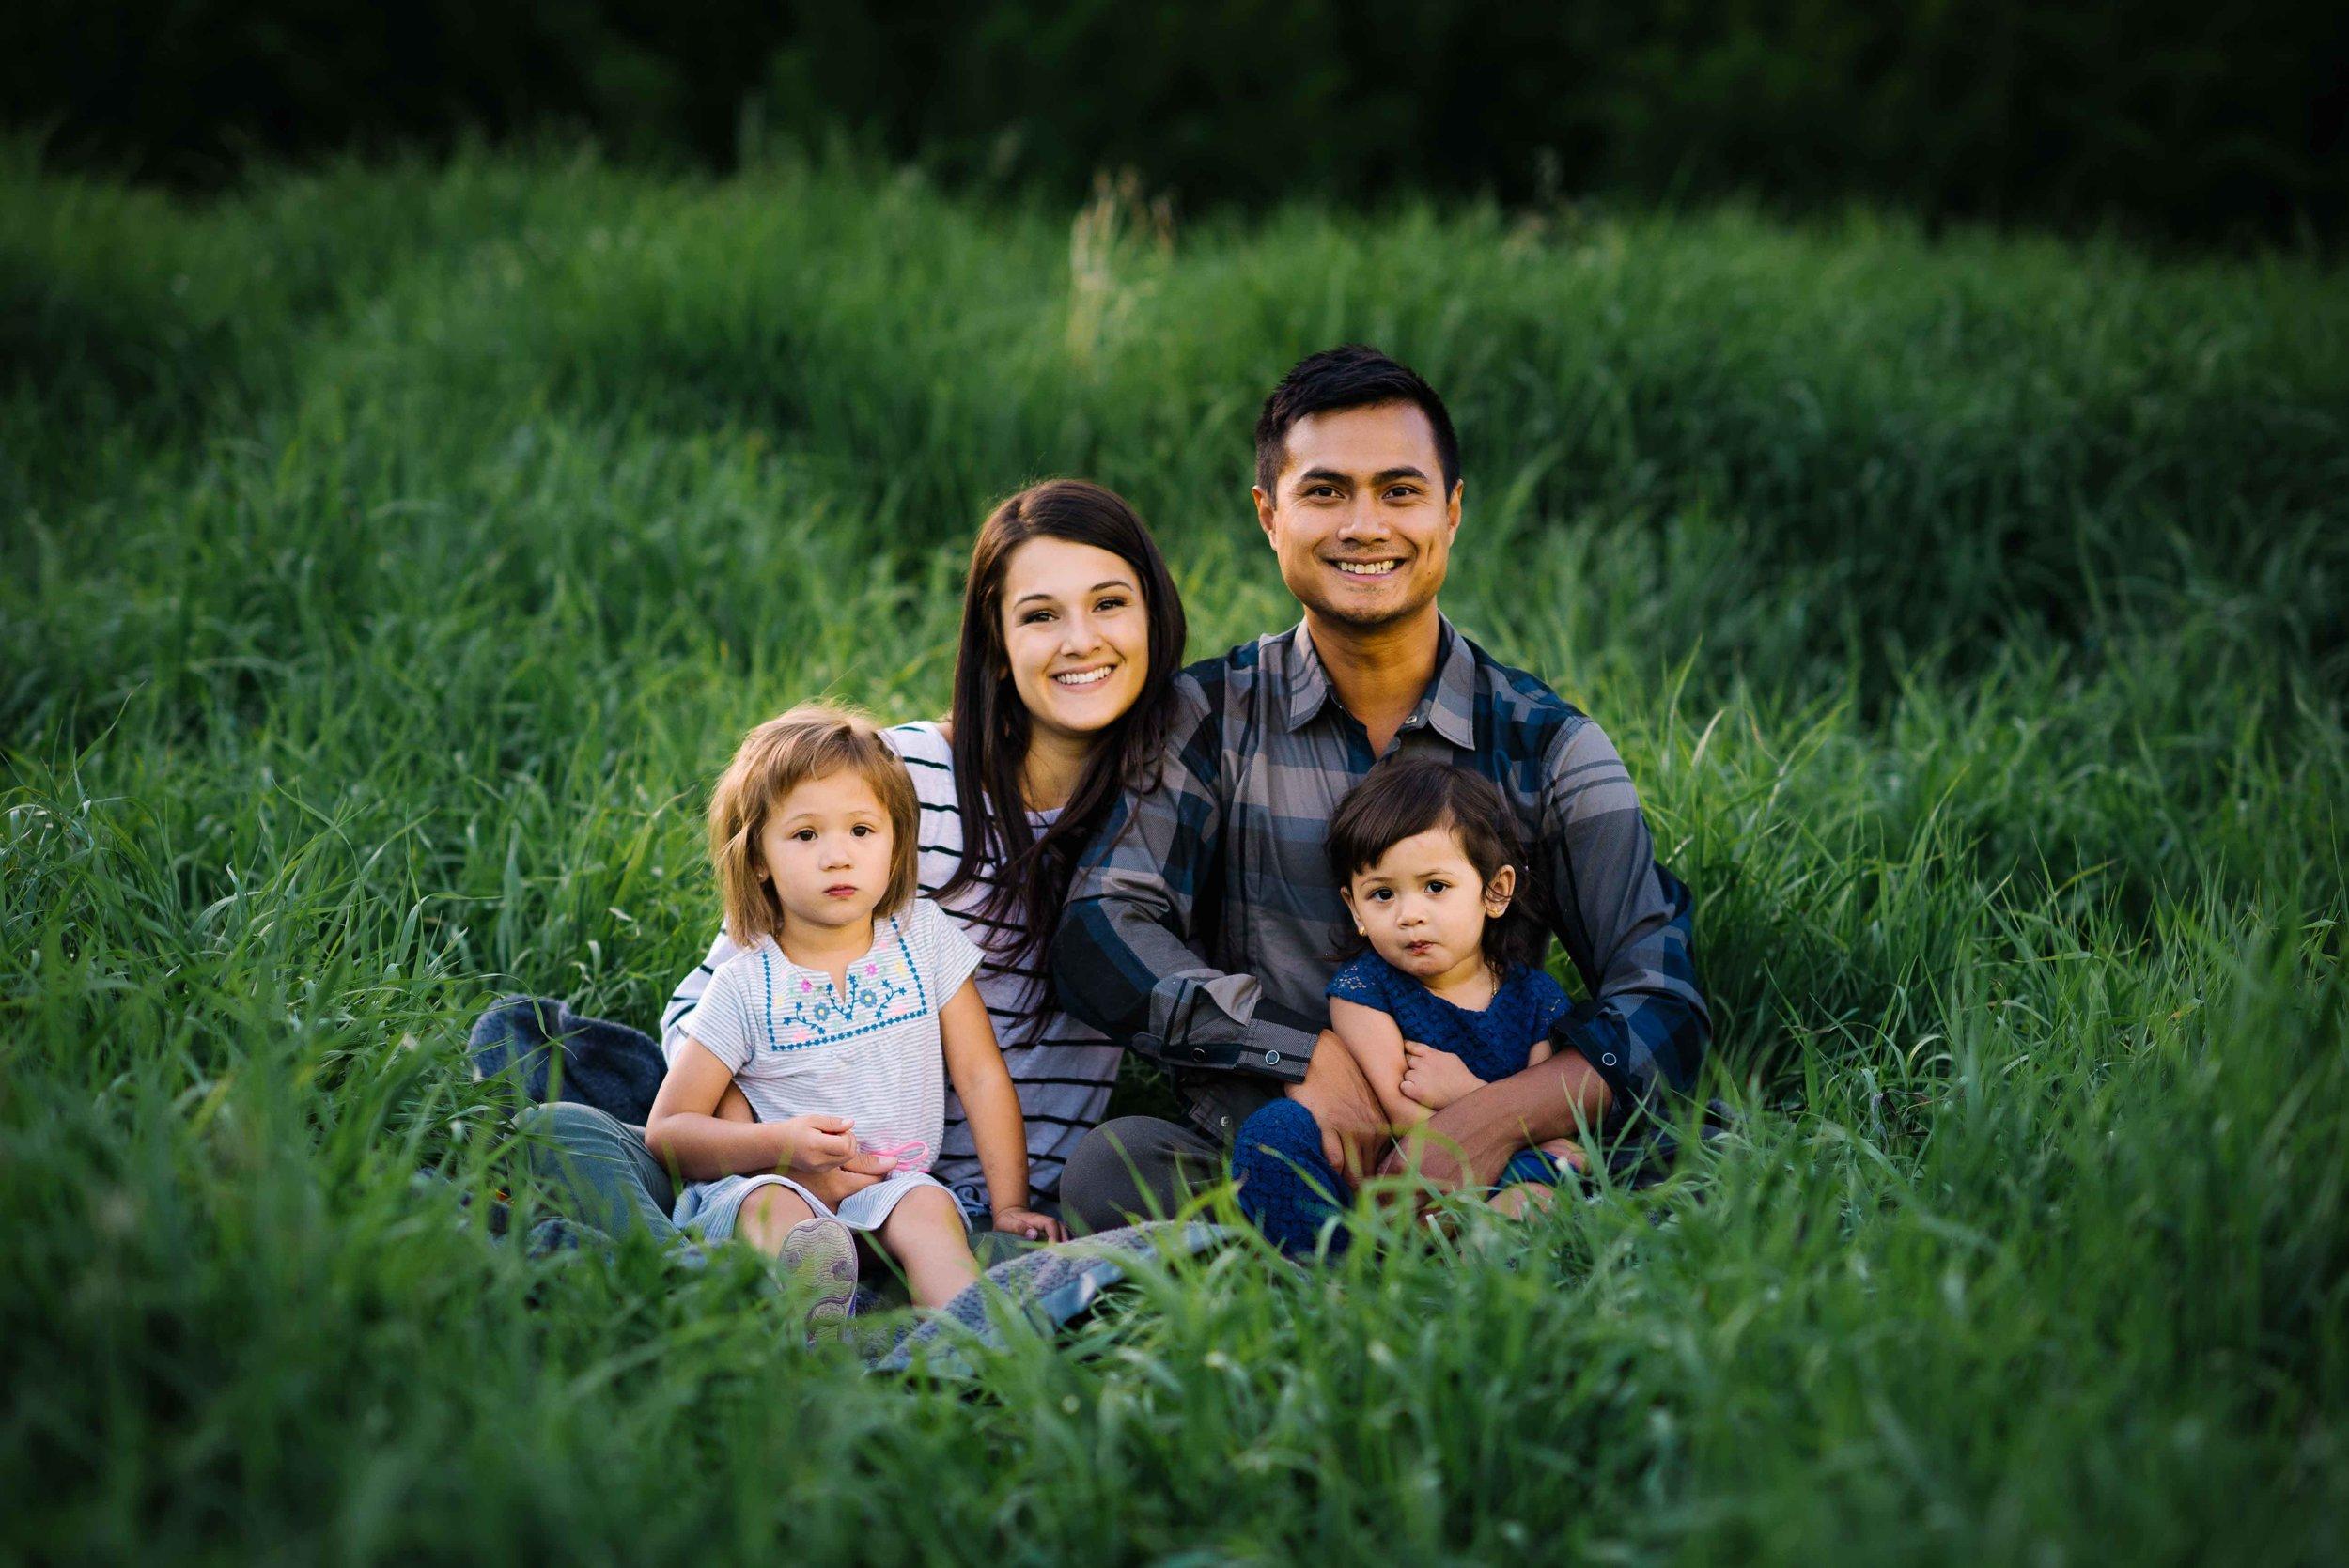 Calgary Canmore Banff Fernie Newborn Family Maternity Photography-114.jpg